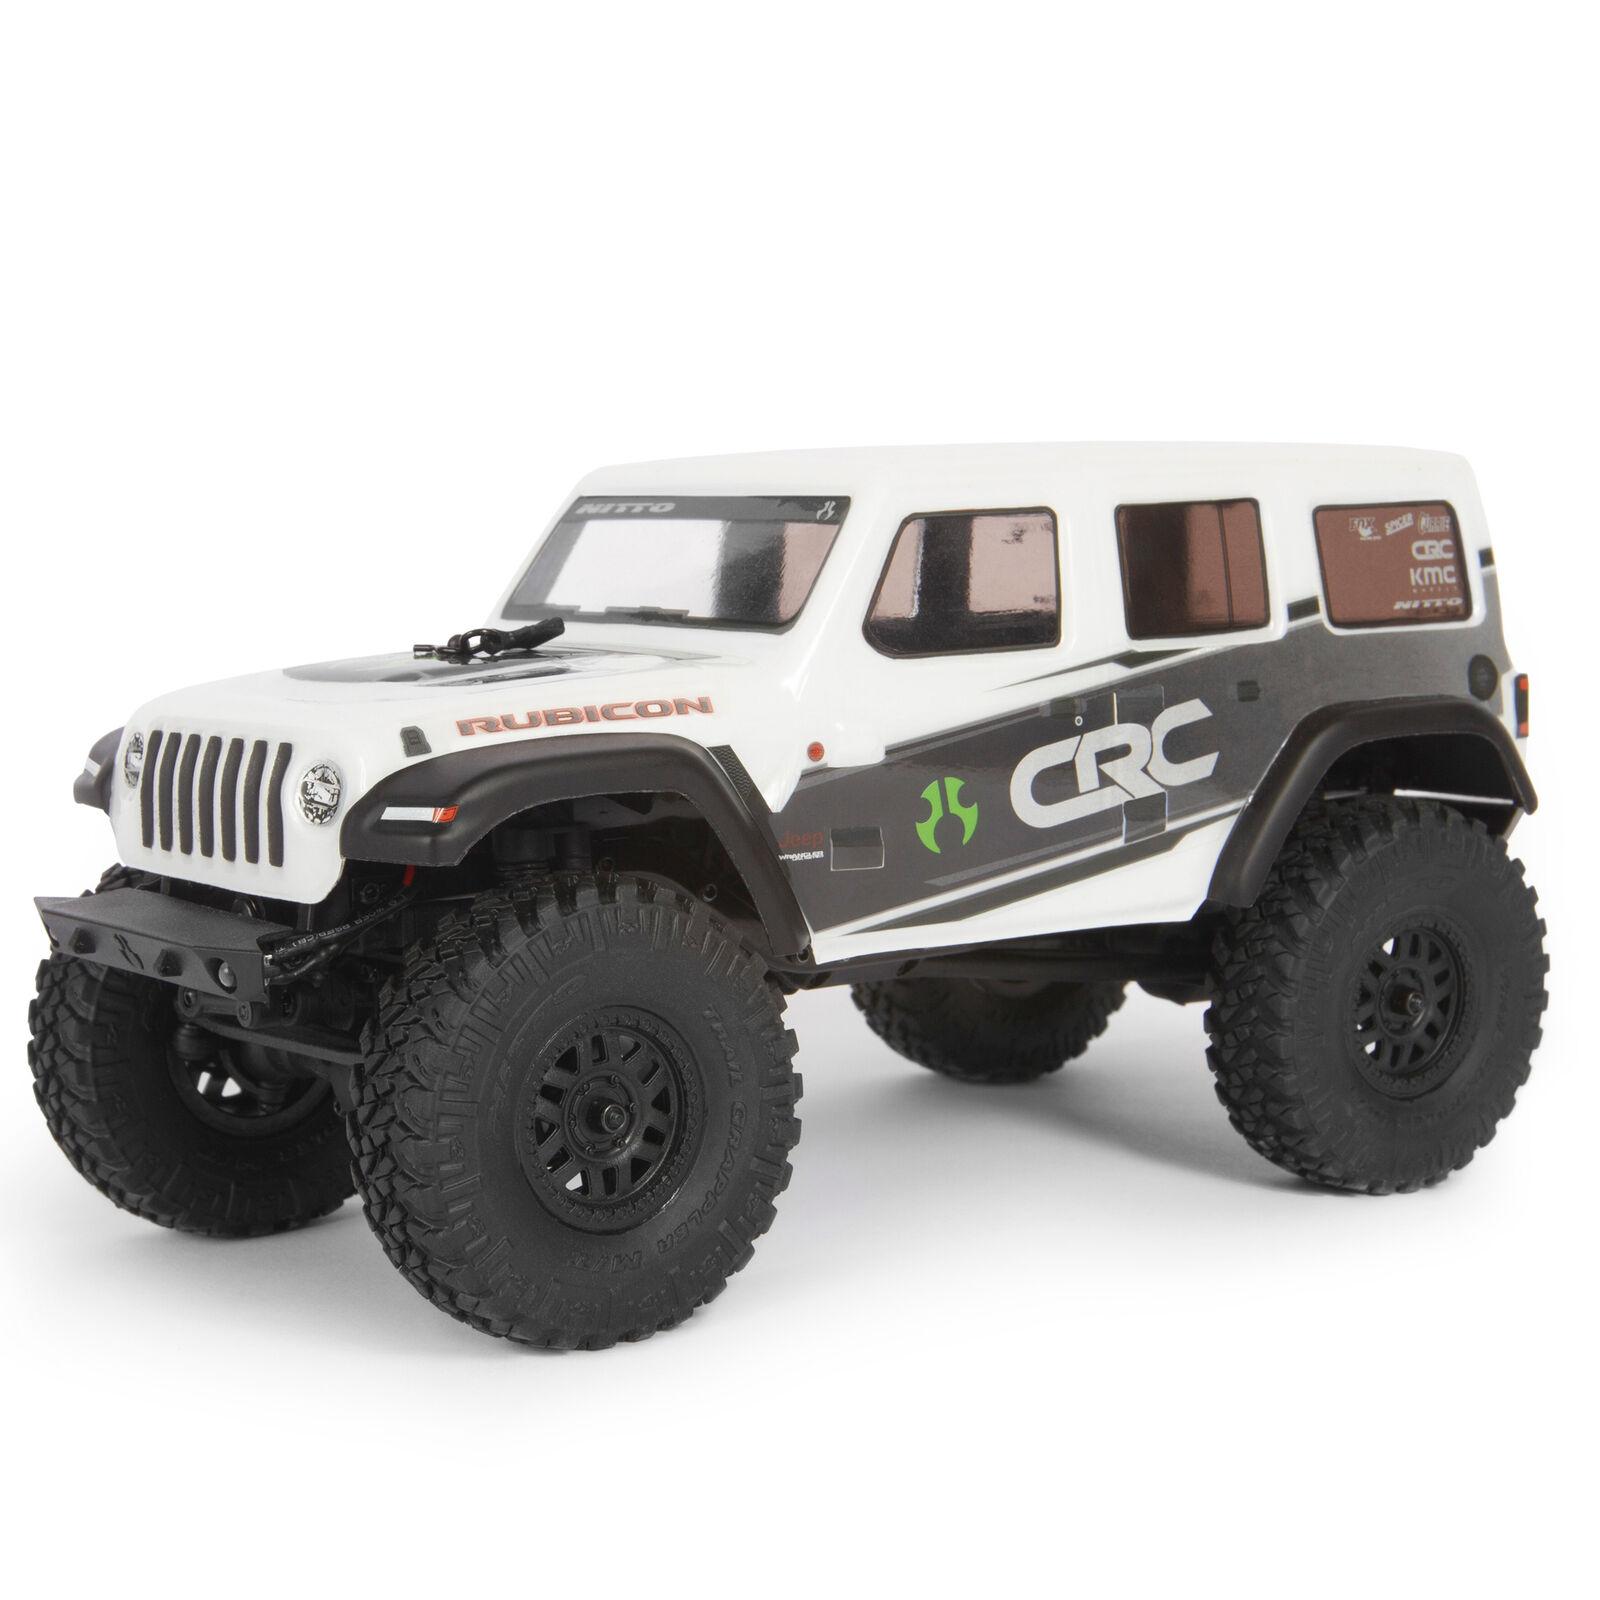 1/24 SCX24 2019 Jeep Wrangler JLU CRC 4WD Rock Crawler Brushed RTR, White